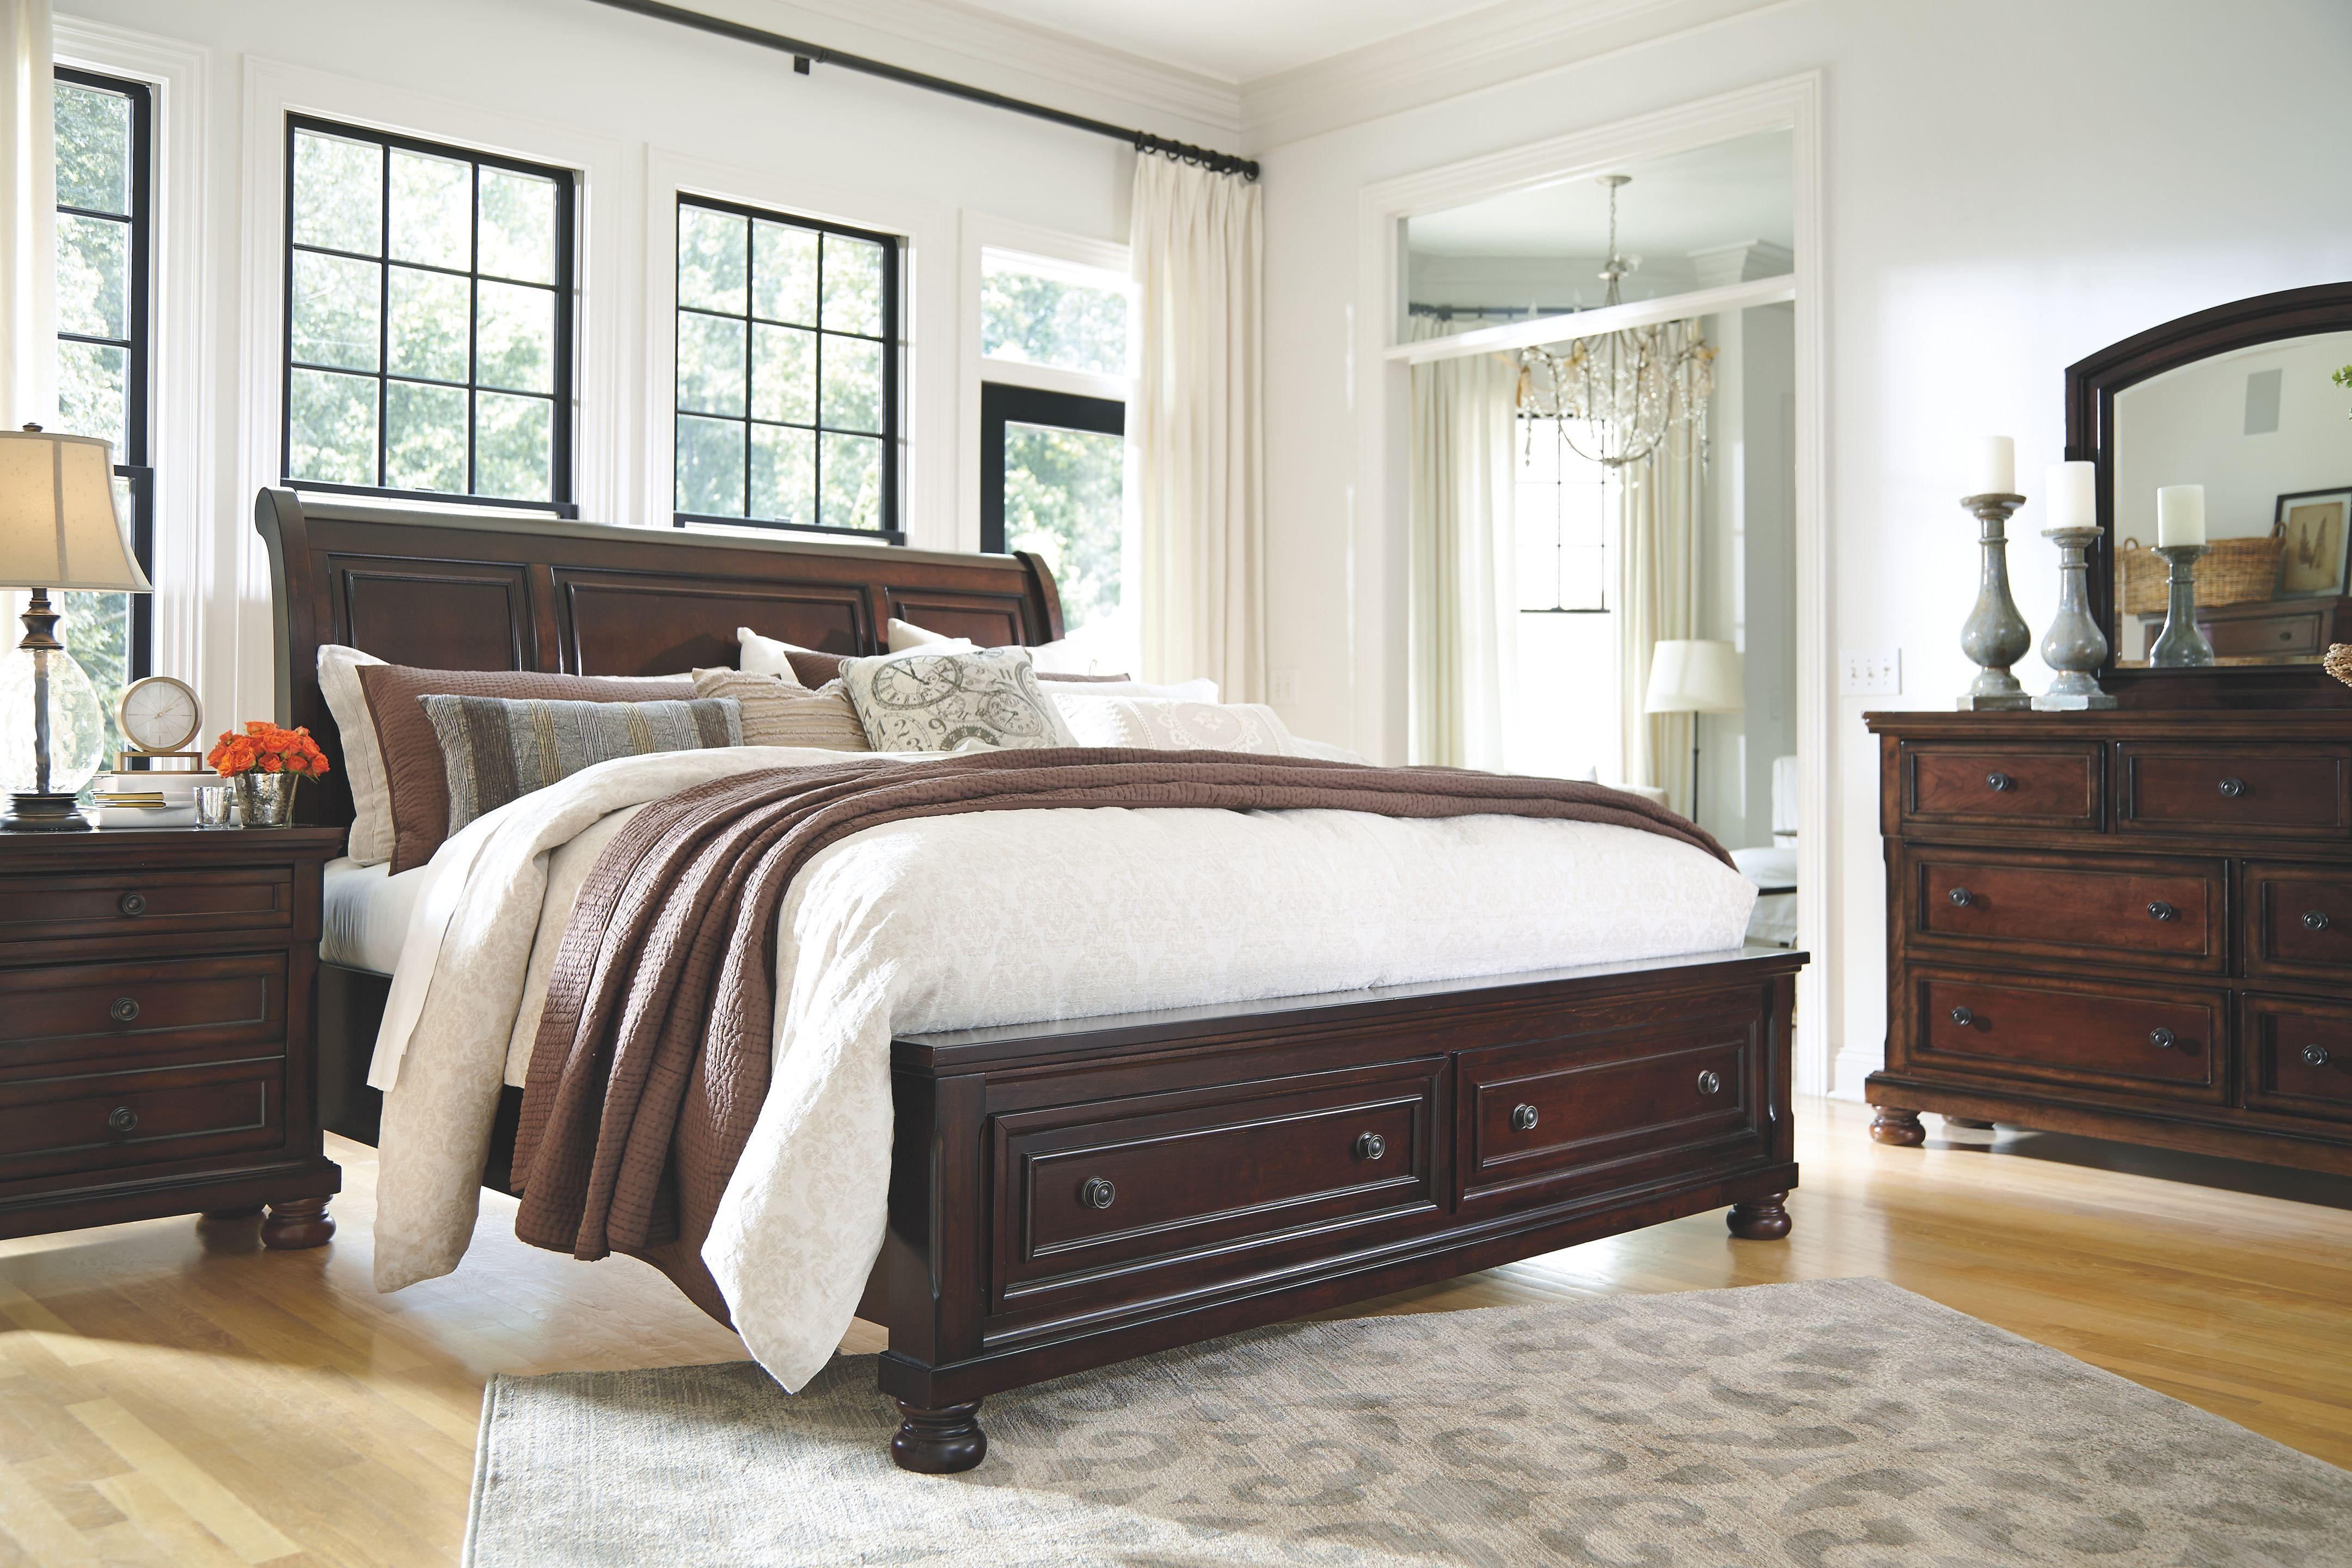 Porter Queen Sleigh Bed Rustic Brown Ashley Furniture Bedroom